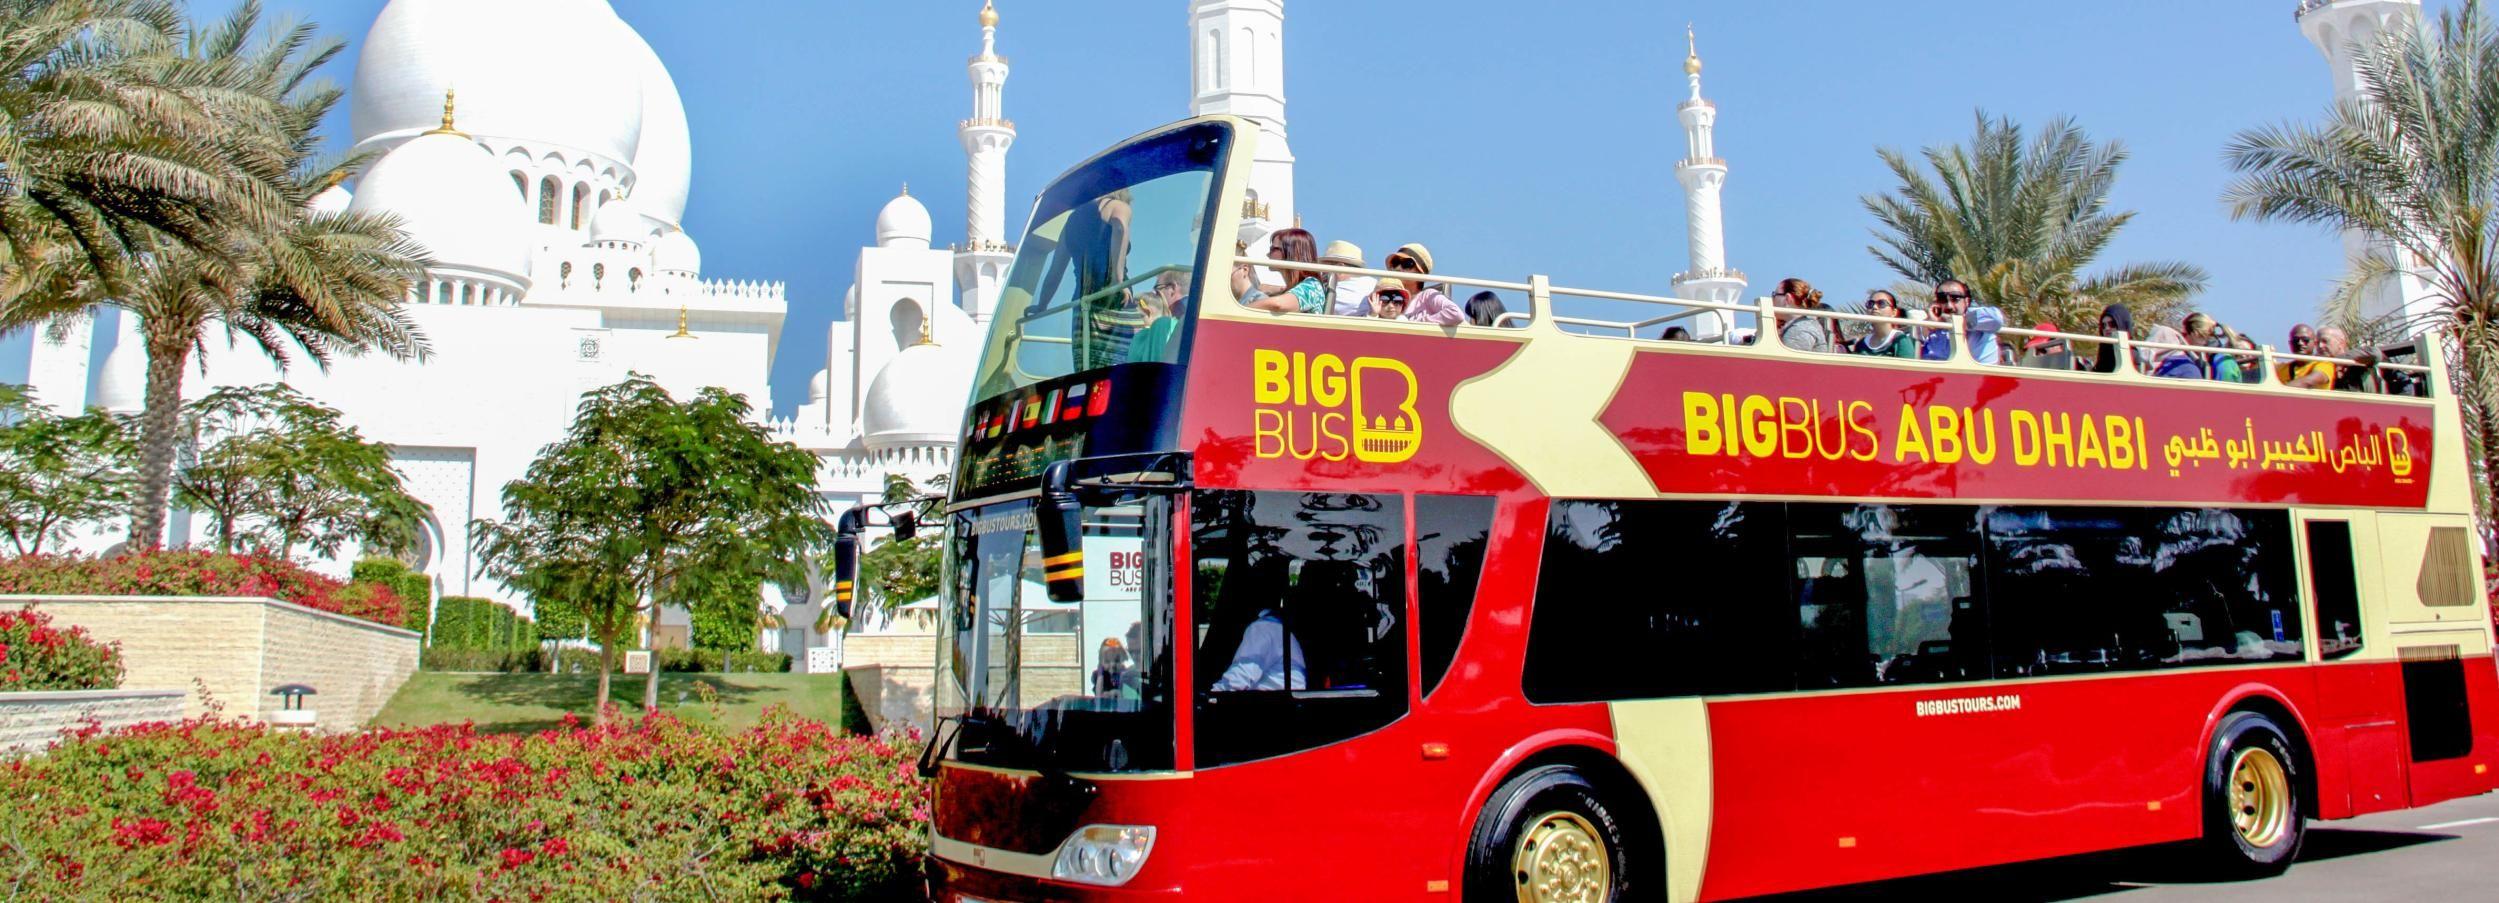 Abu Dhabi: Classic 1-Day Hop-On Hop-Off Tour